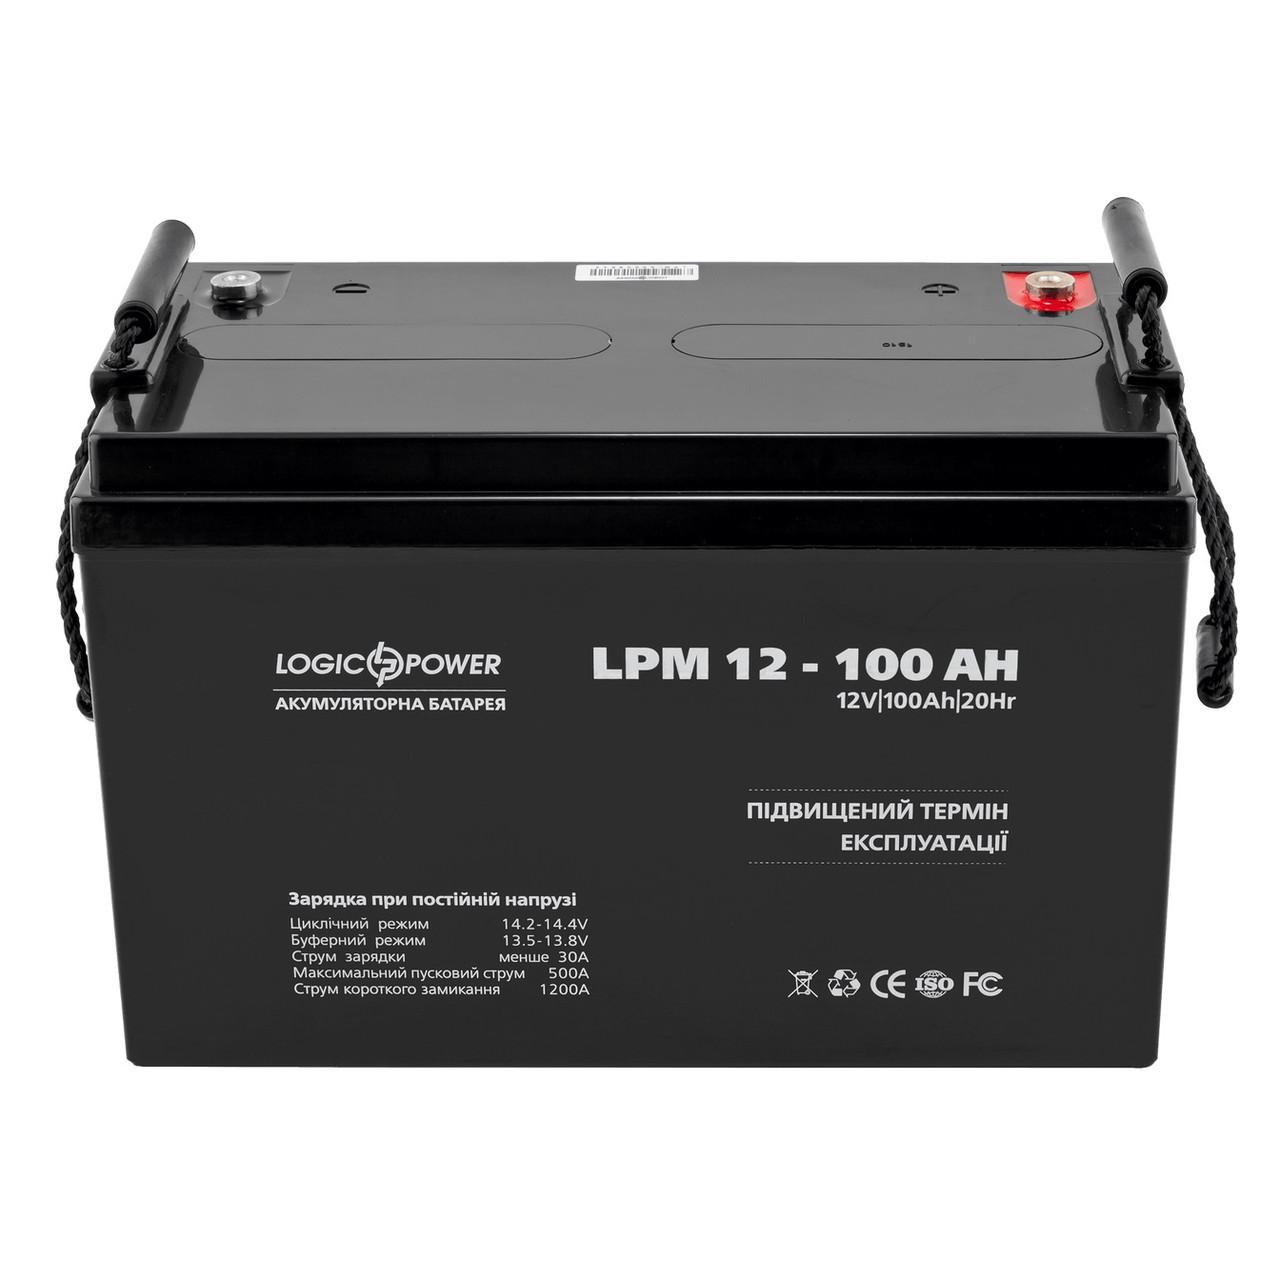 Аккумулятор свинцово-кислотный LogicPower AGM LPM 12 - 100 AH